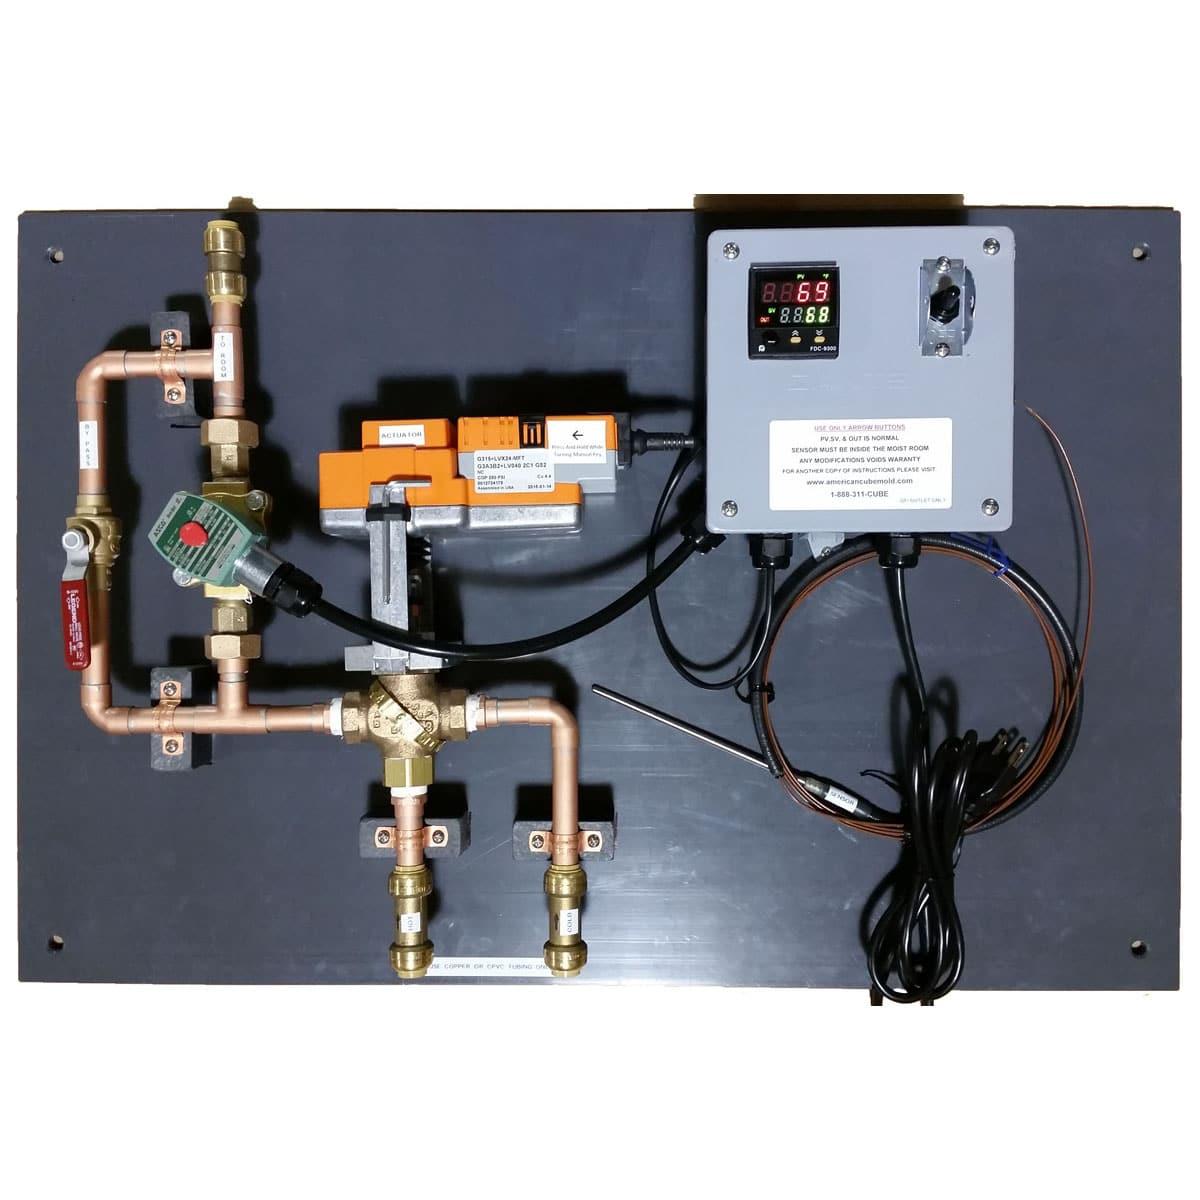 Humidity Control Equipment : Moisture room control system myers associates inc